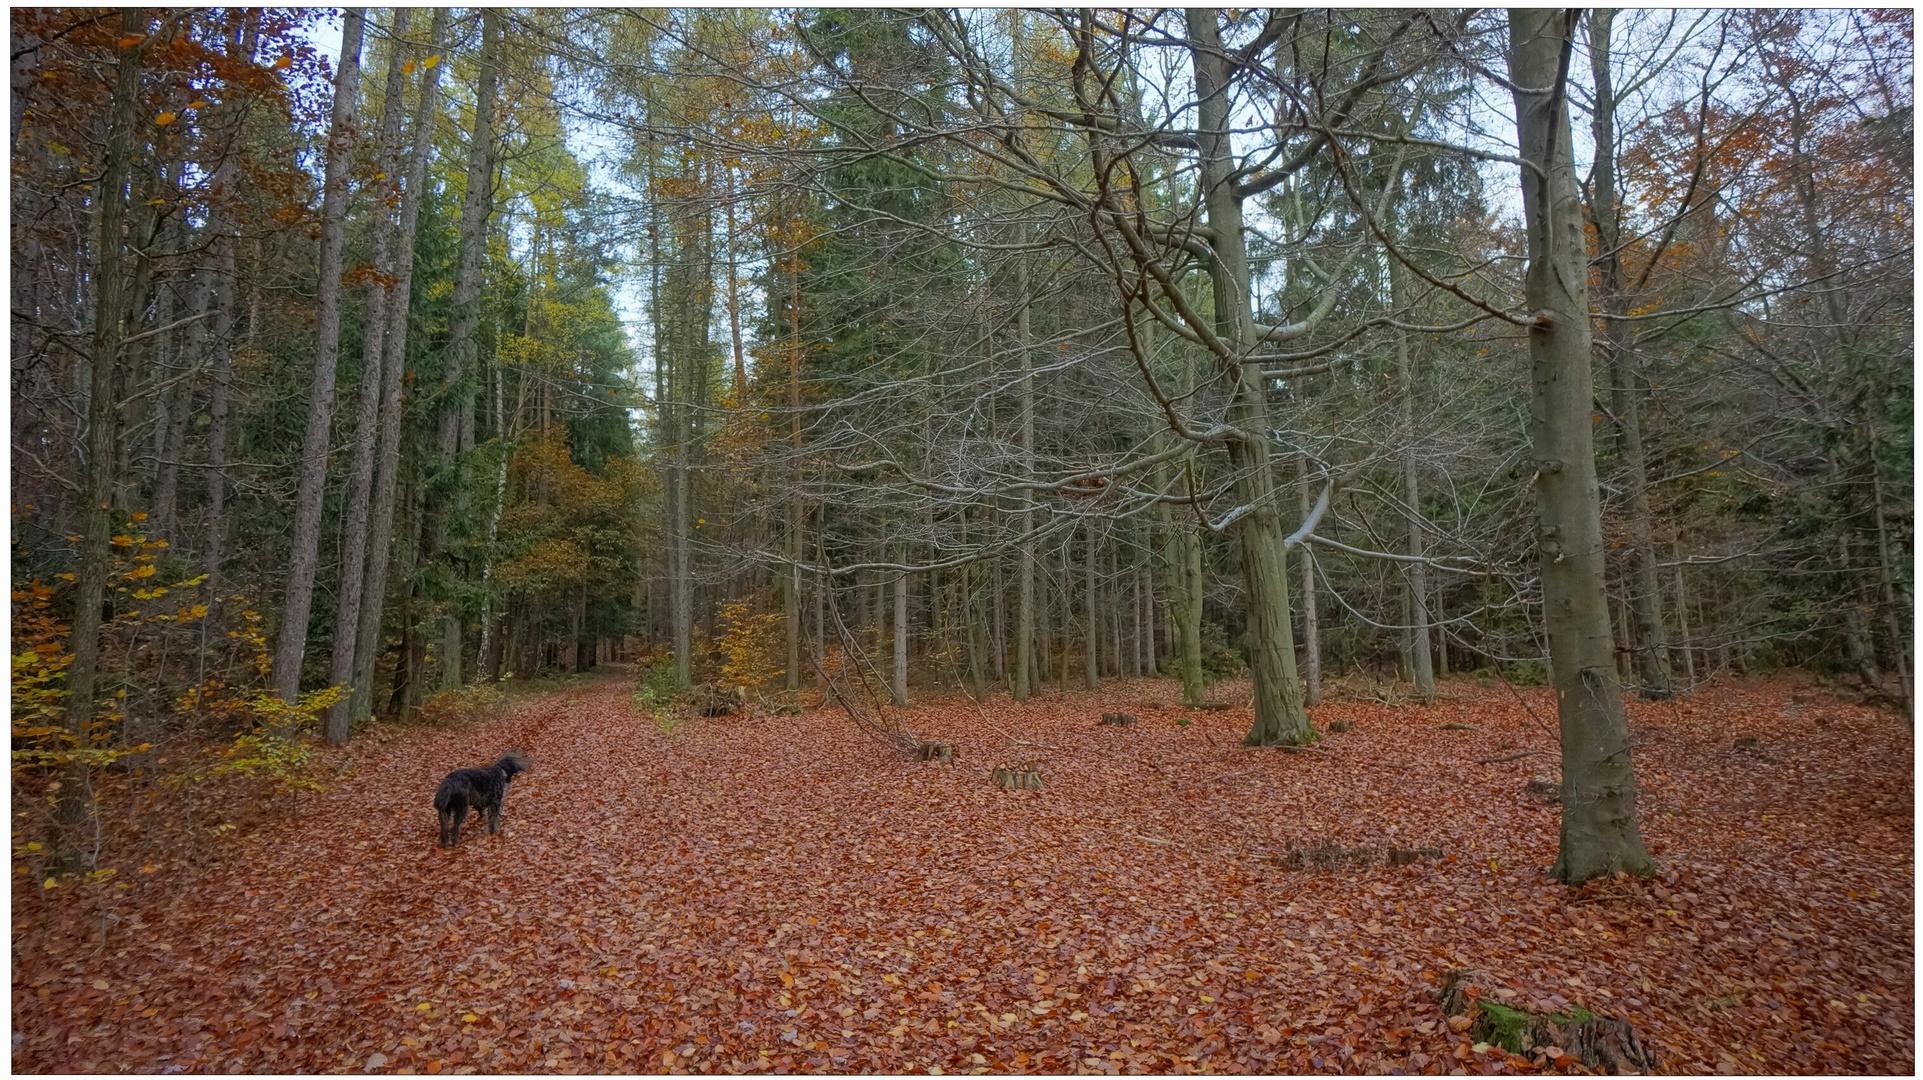 Paseando con Wicky-Emily por el bosque otoñal II (mit Wicky-Emily im Herbstwald II)